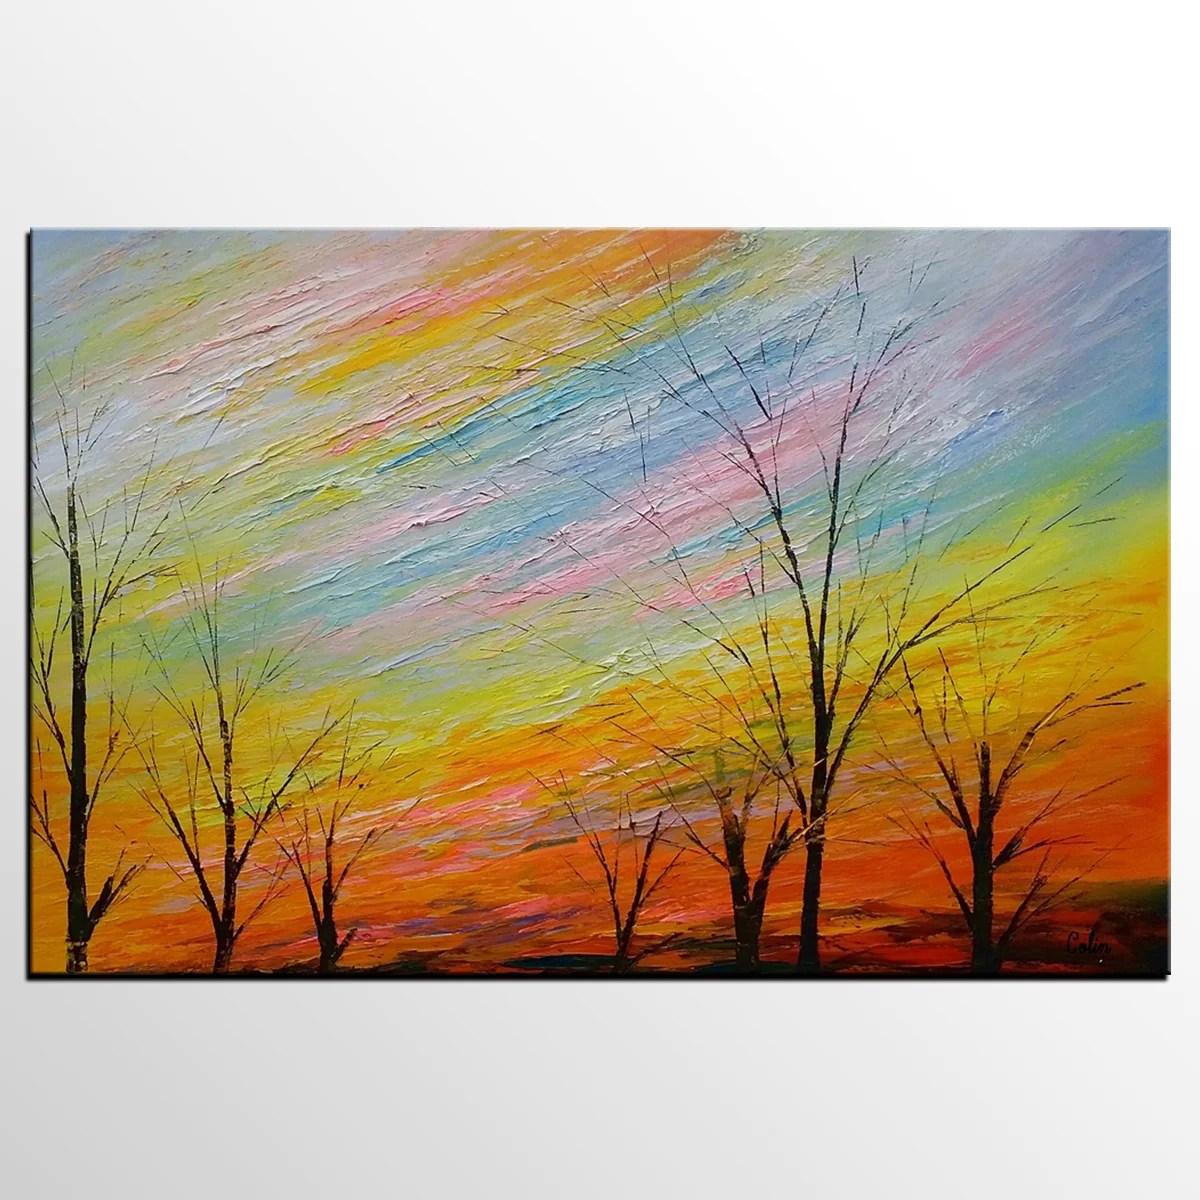 Art Painting, Original Painting, Colorful Sky Painting